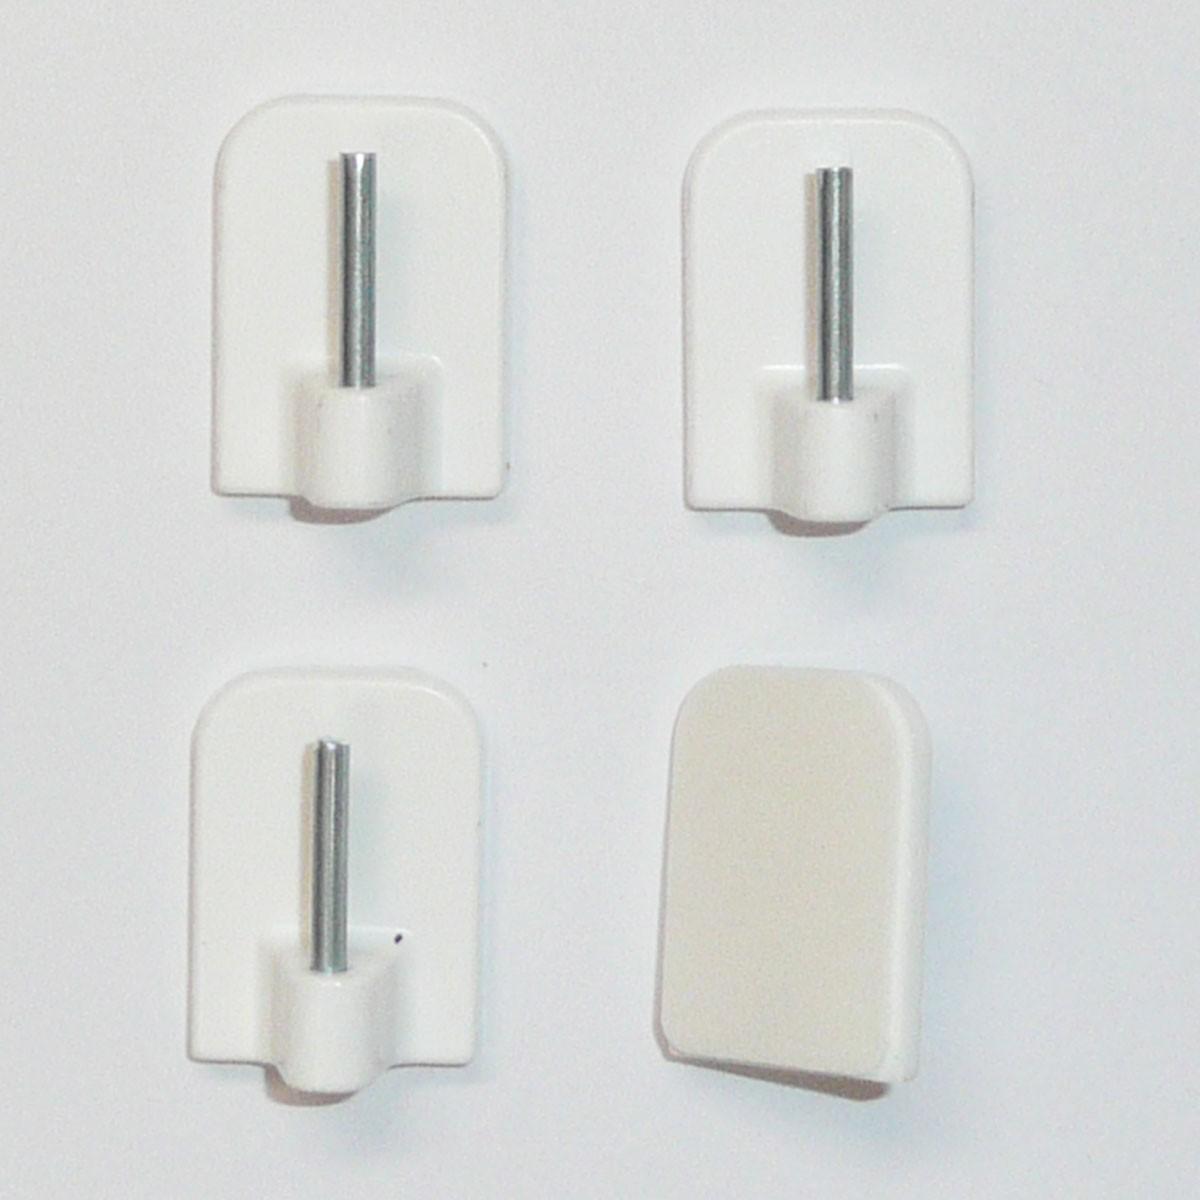 klebehaken selbstklebehaken f r vitragenstangen weiss 4er. Black Bedroom Furniture Sets. Home Design Ideas